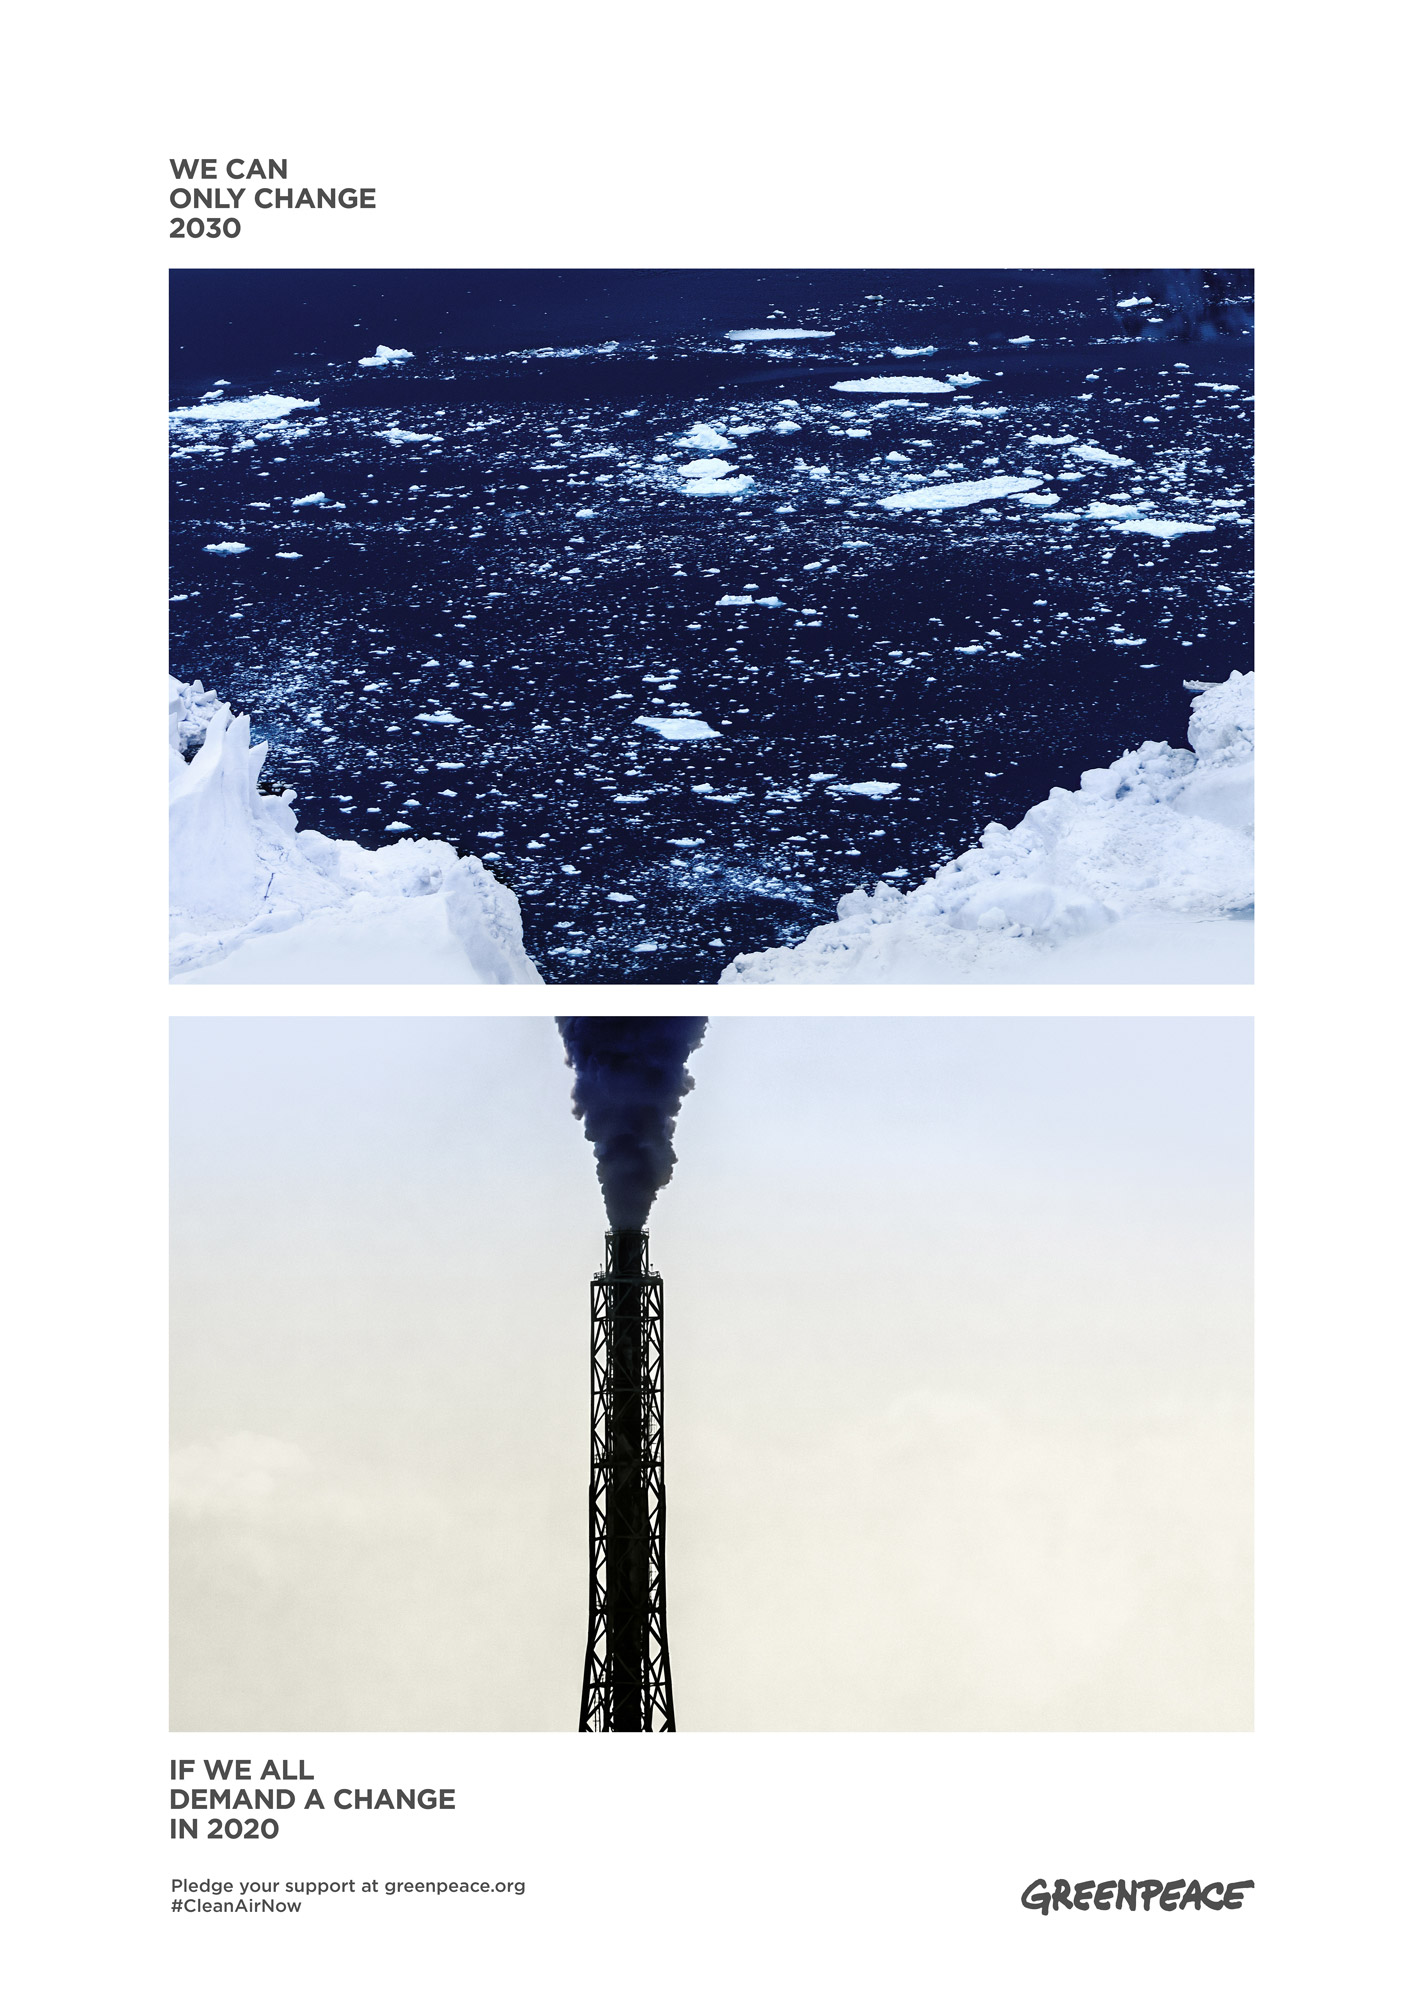 AT_Greenpeace_IMG_03